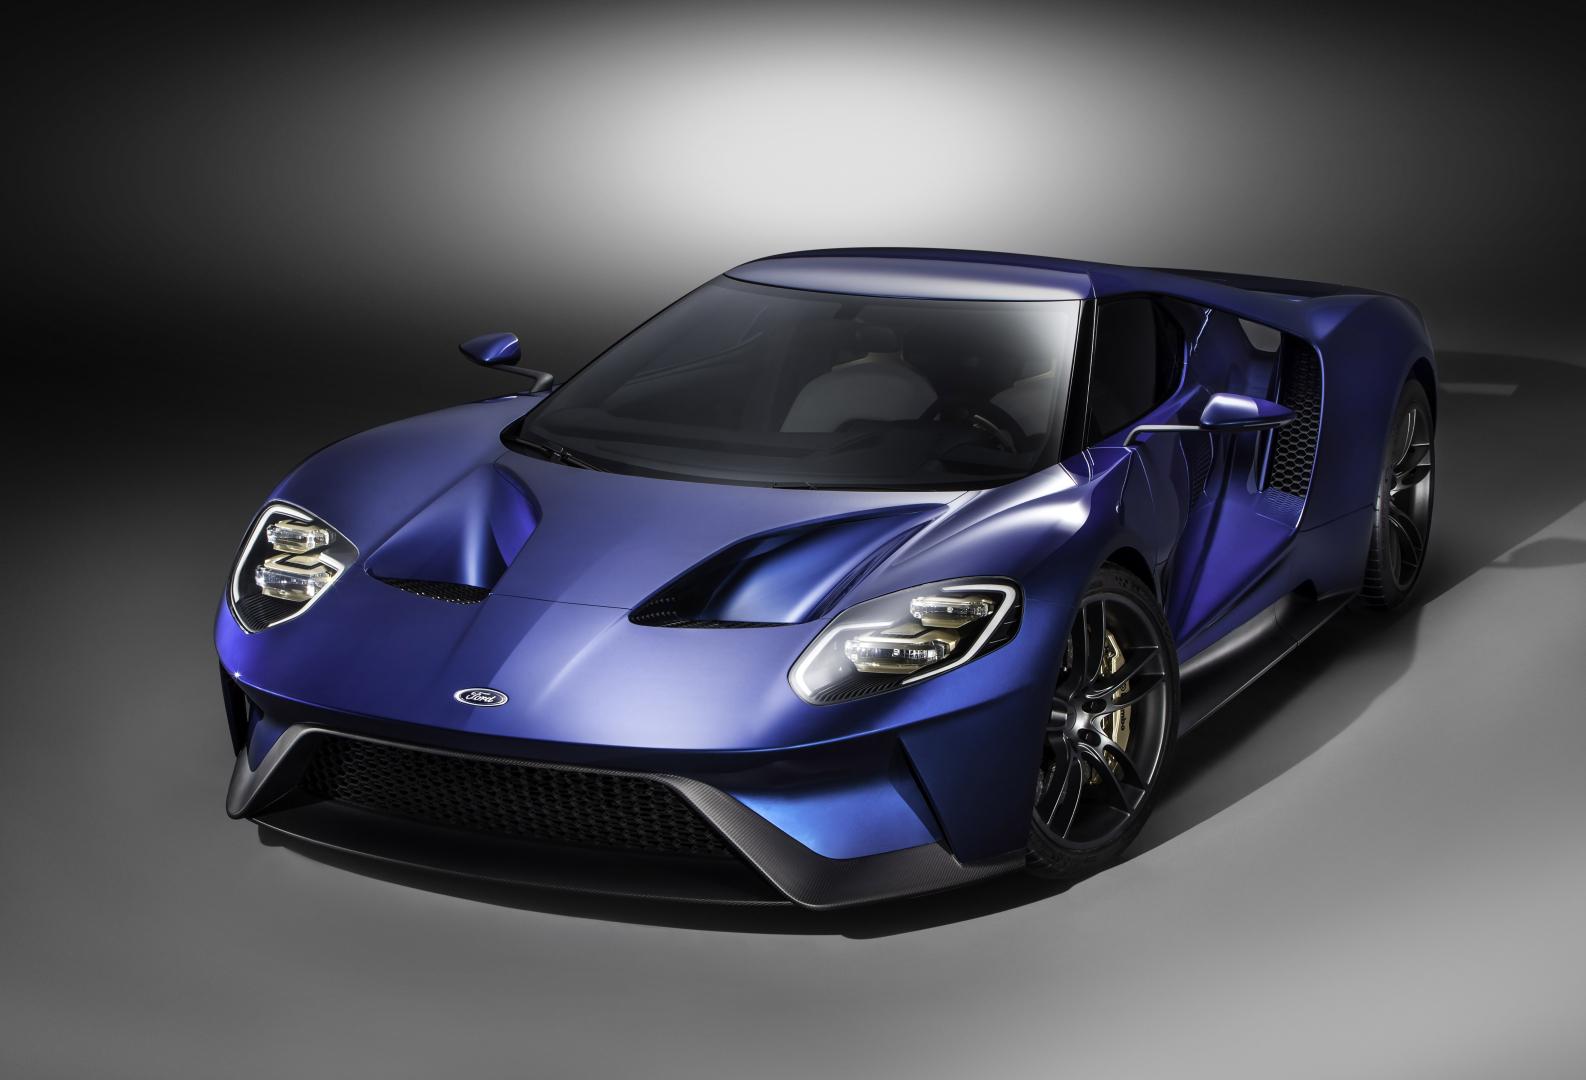 FordSidm2015_GT_001